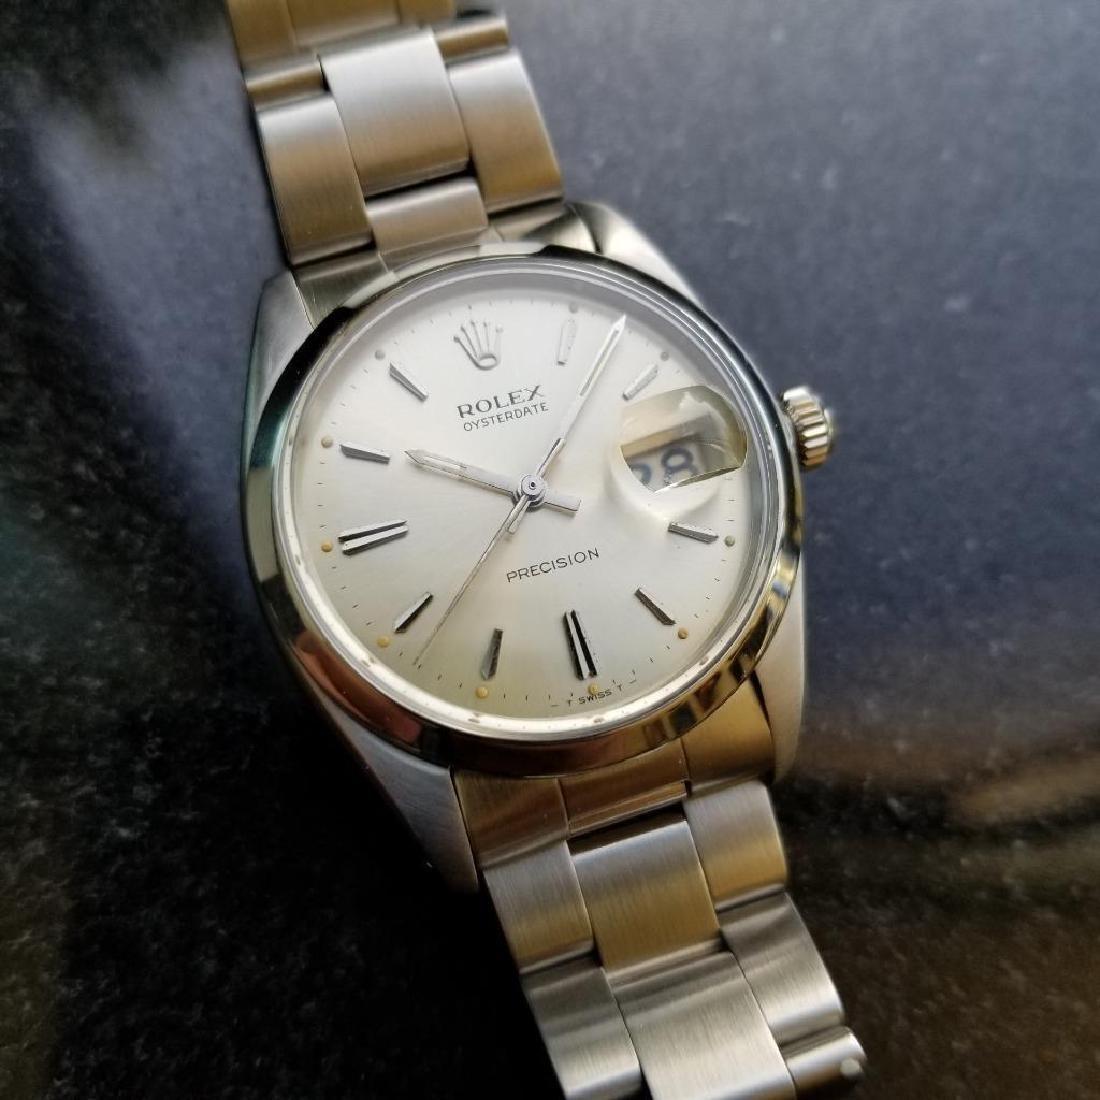 Rolex Vintage Precision Oysterdate 1954 6694 Manual - 4